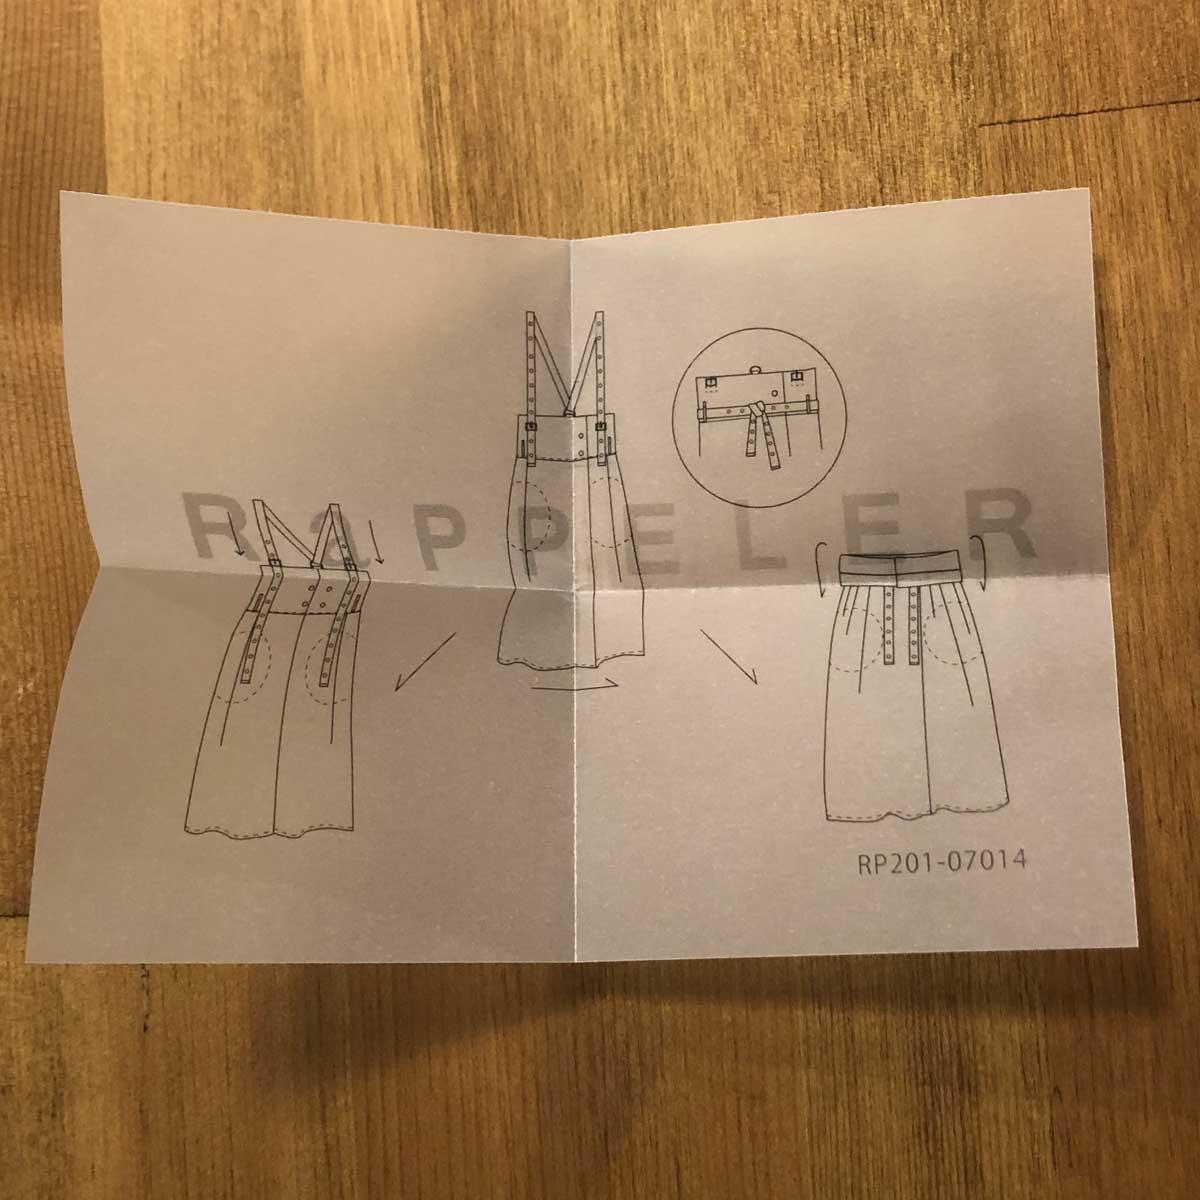 RaPPELER ラプレ デニムサスペンダーパンツ